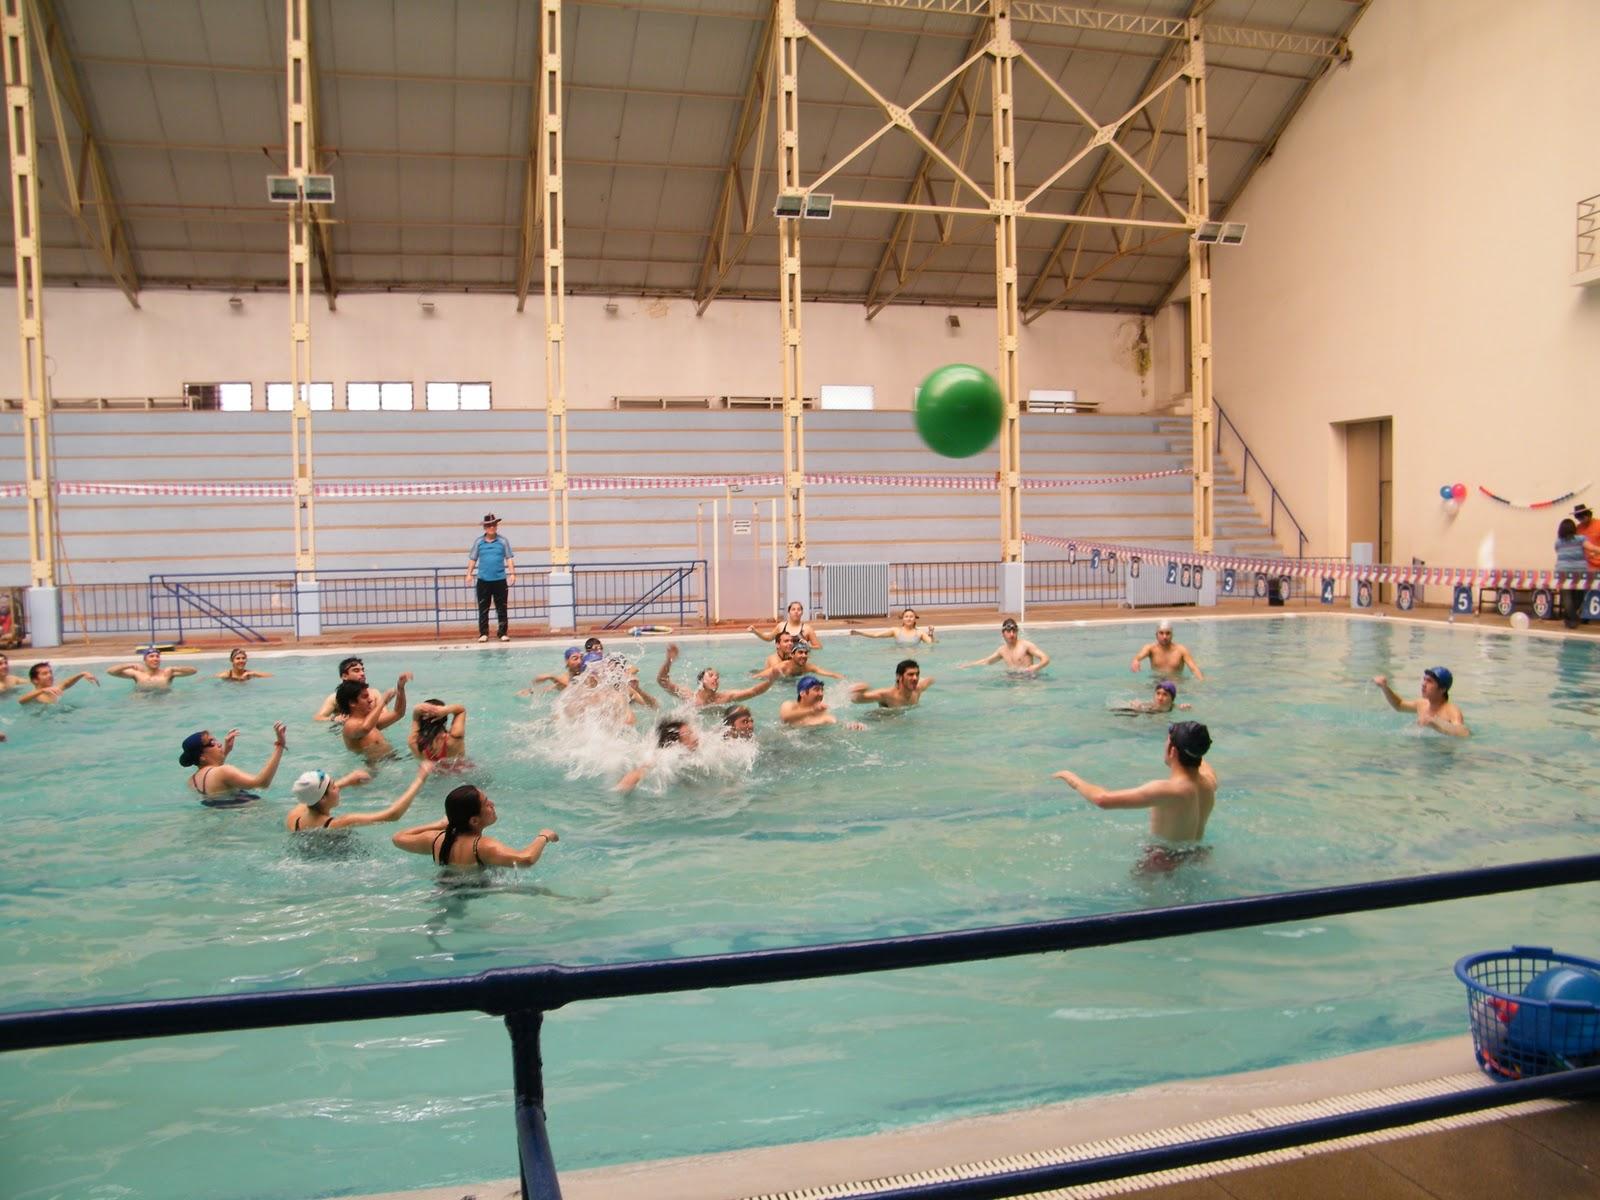 Nataci n universitaria u de chile piscina recreativa for Piscina universitaria